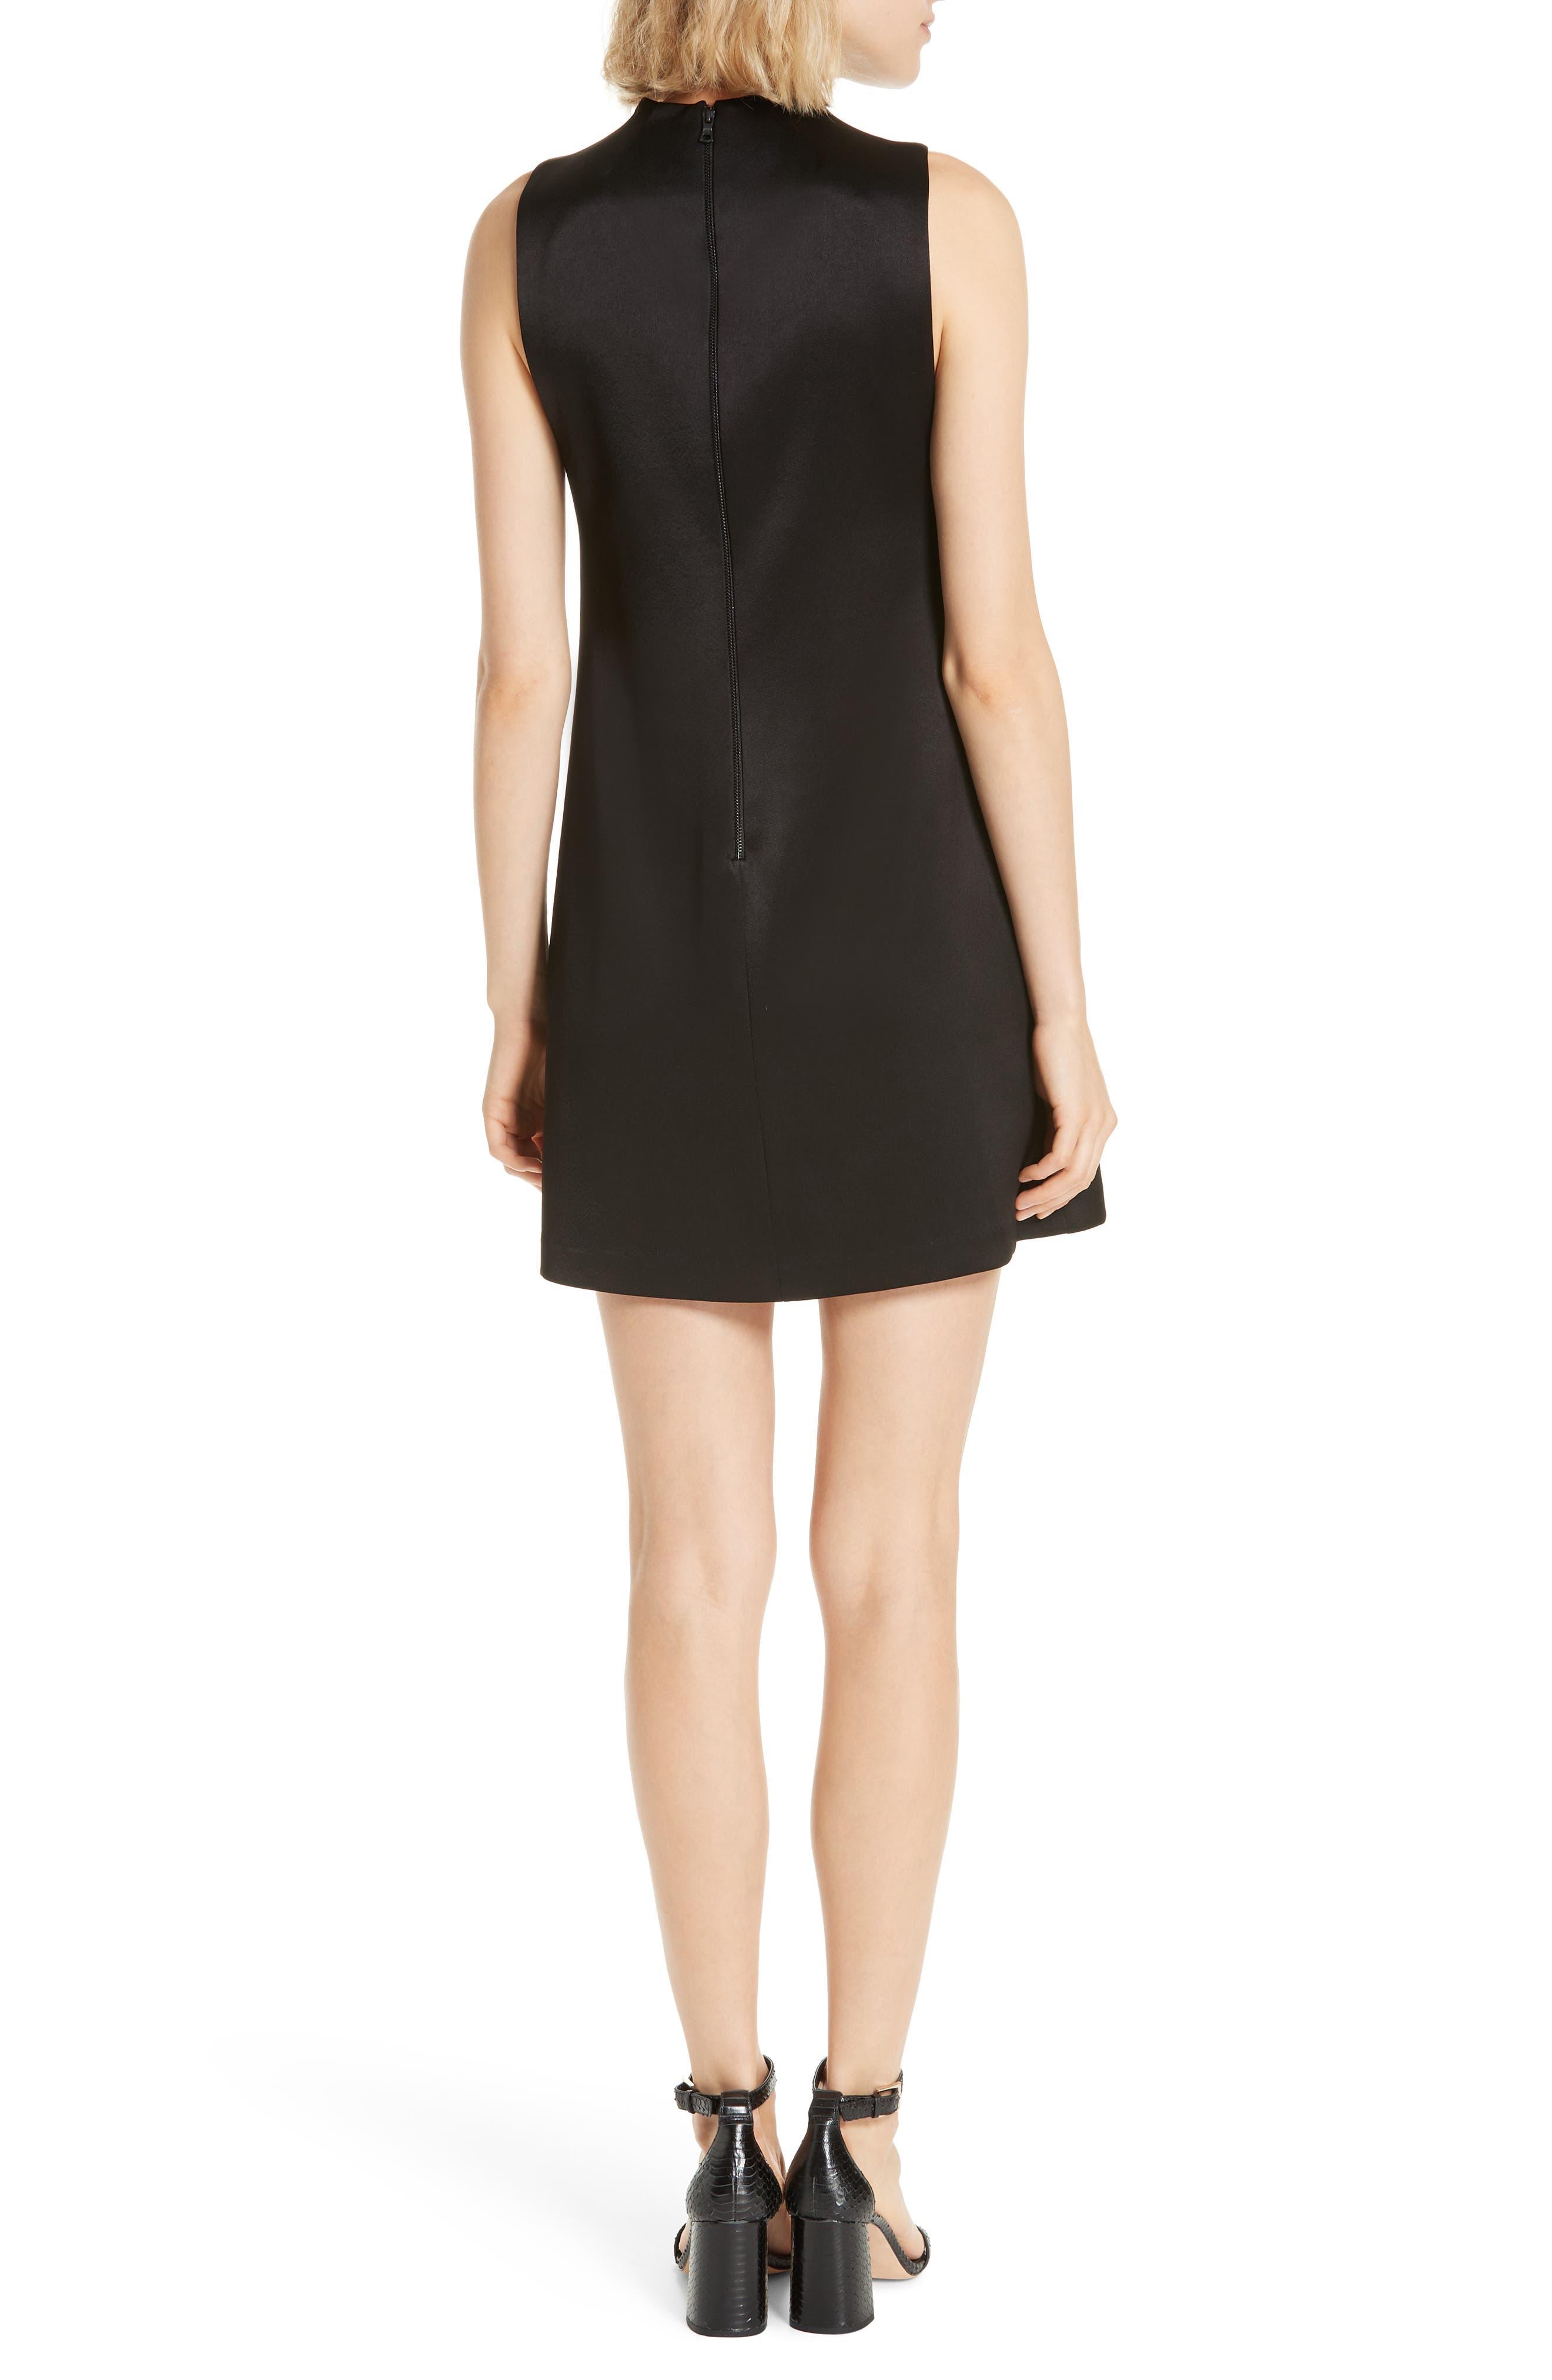 ALICE + OLIVIA,                             Coley A-Line Shift Dress,                             Alternate thumbnail 2, color,                             BLACK